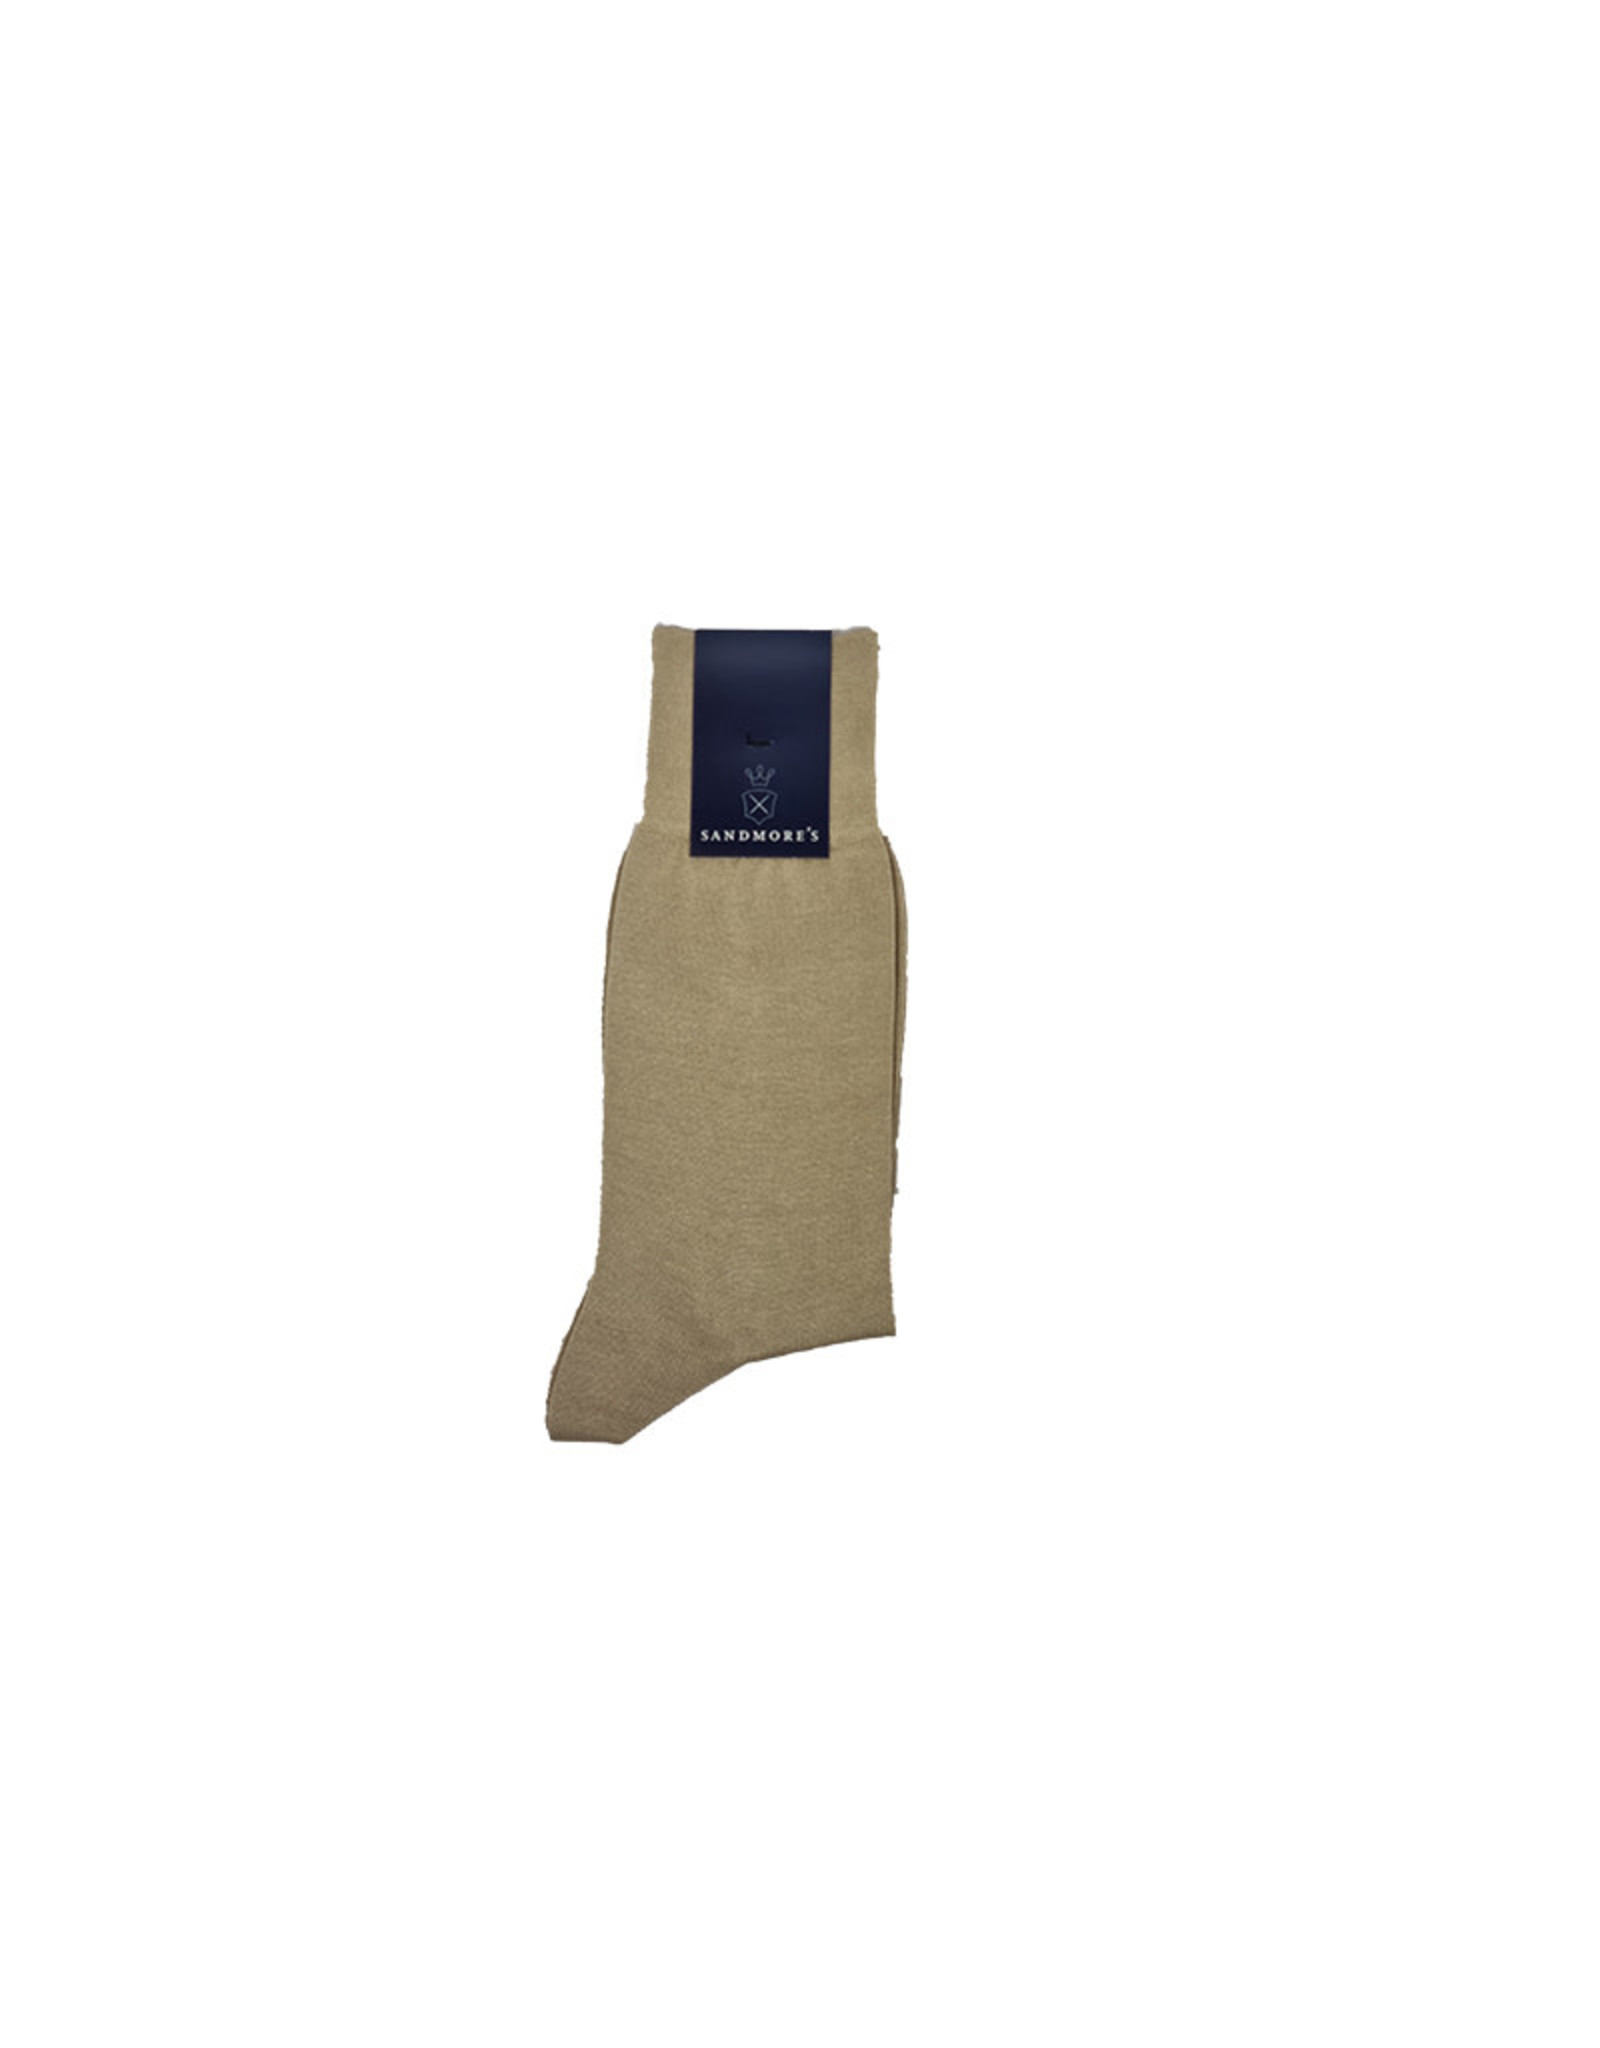 Russo Italia Sandmore's sokken katoen beige M505